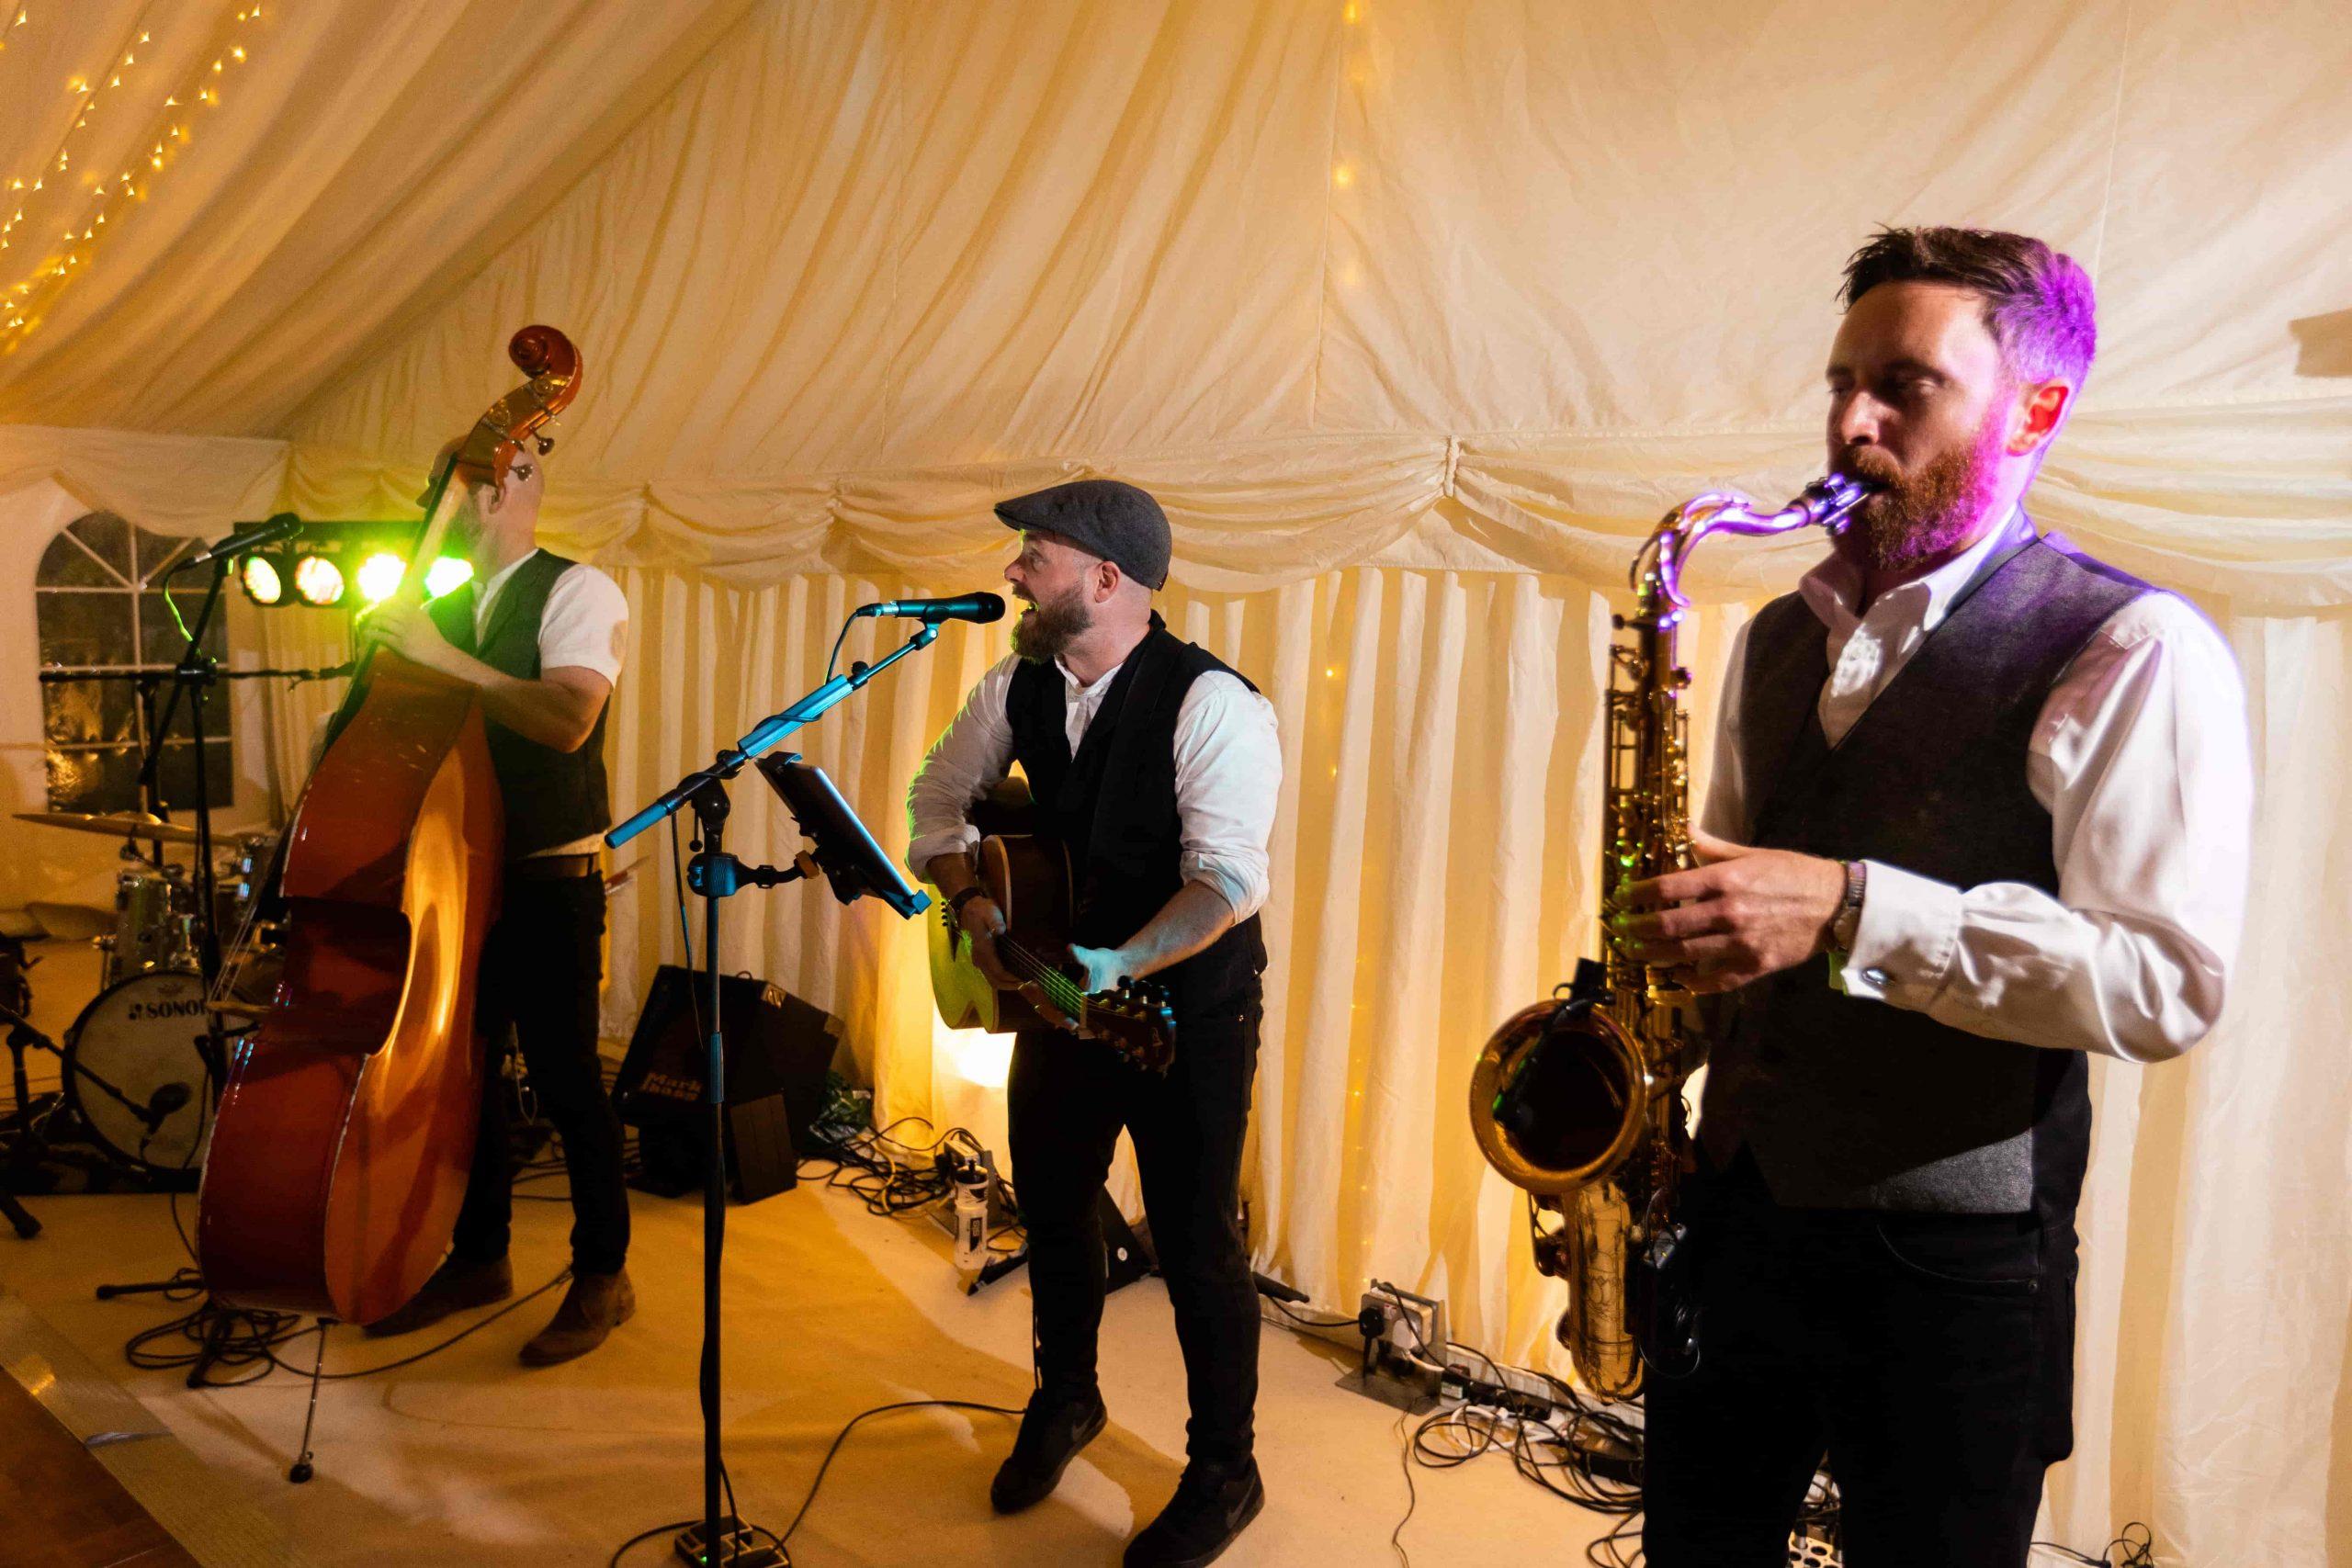 Festival folk wedding band The Wildermen